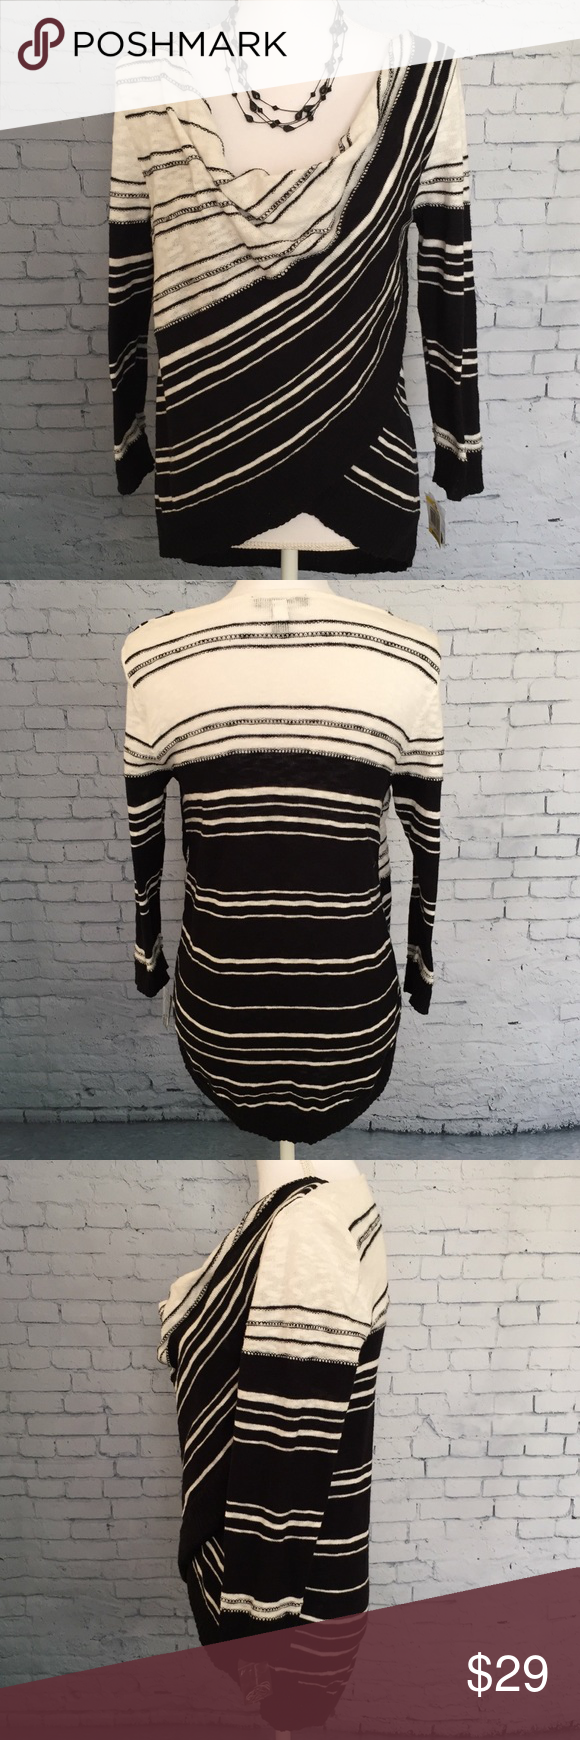 inc international concepts cowl neck sweater   brand  inc international concepts   size  medium